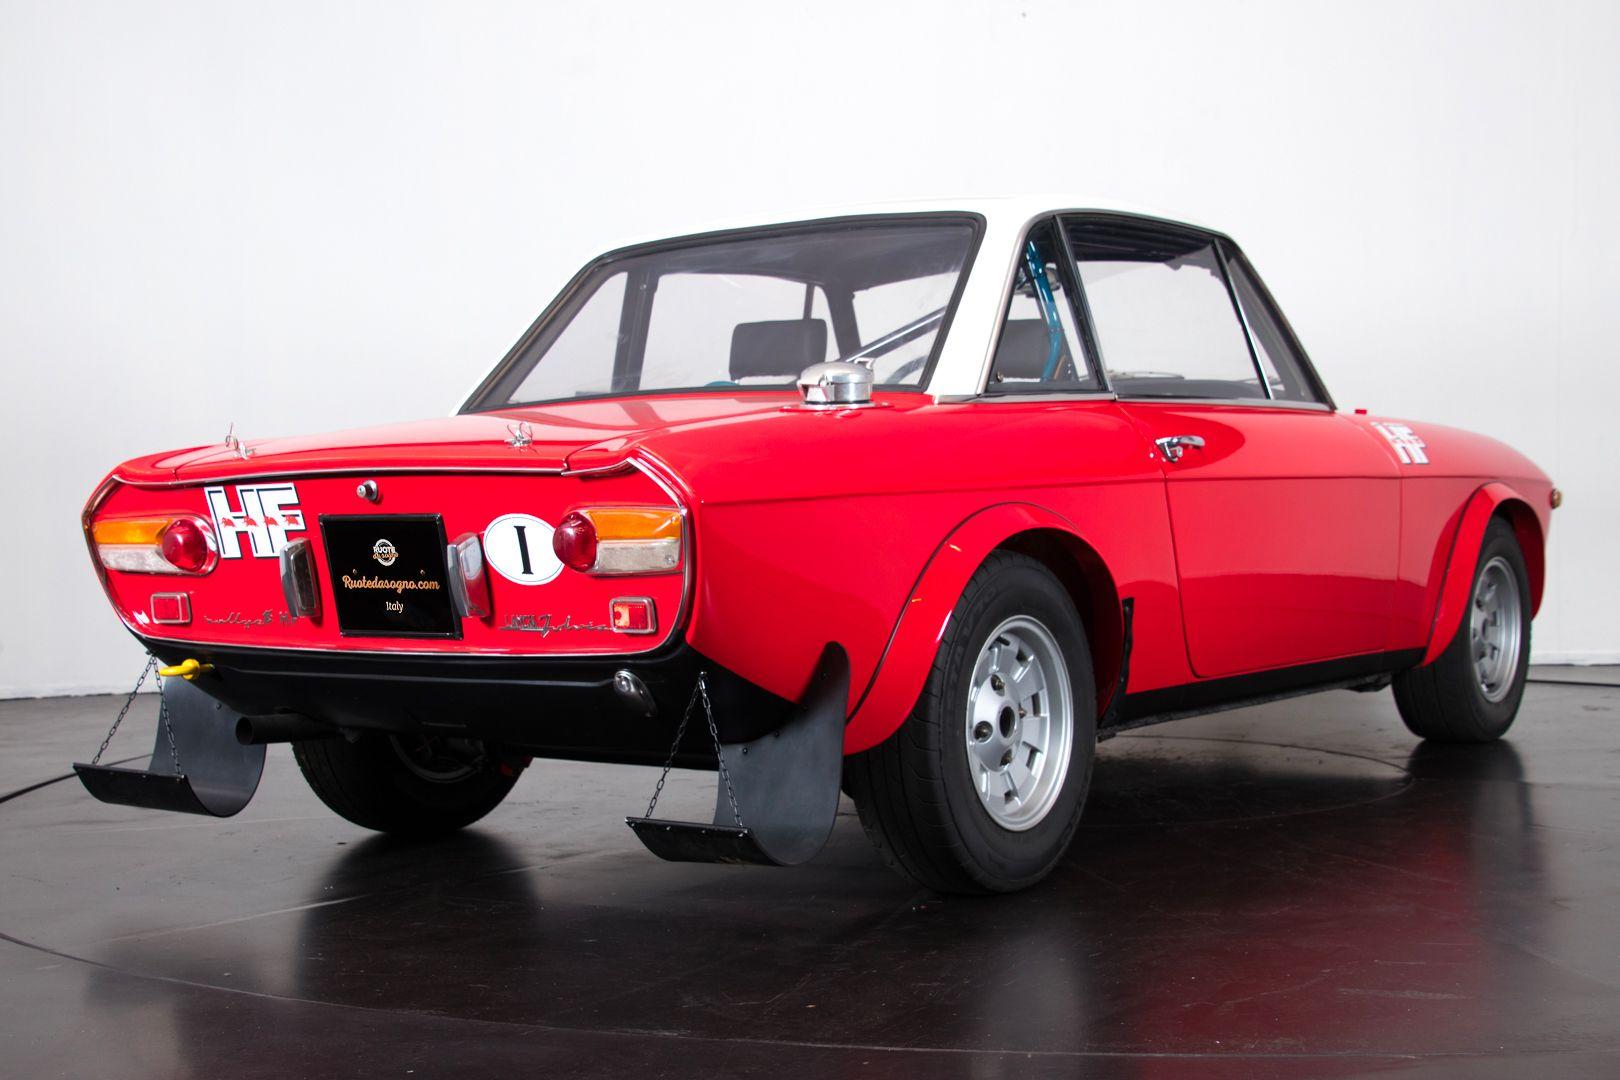 1970 Lancia Fulvia HF 1.6 - Gruppo 4 18800